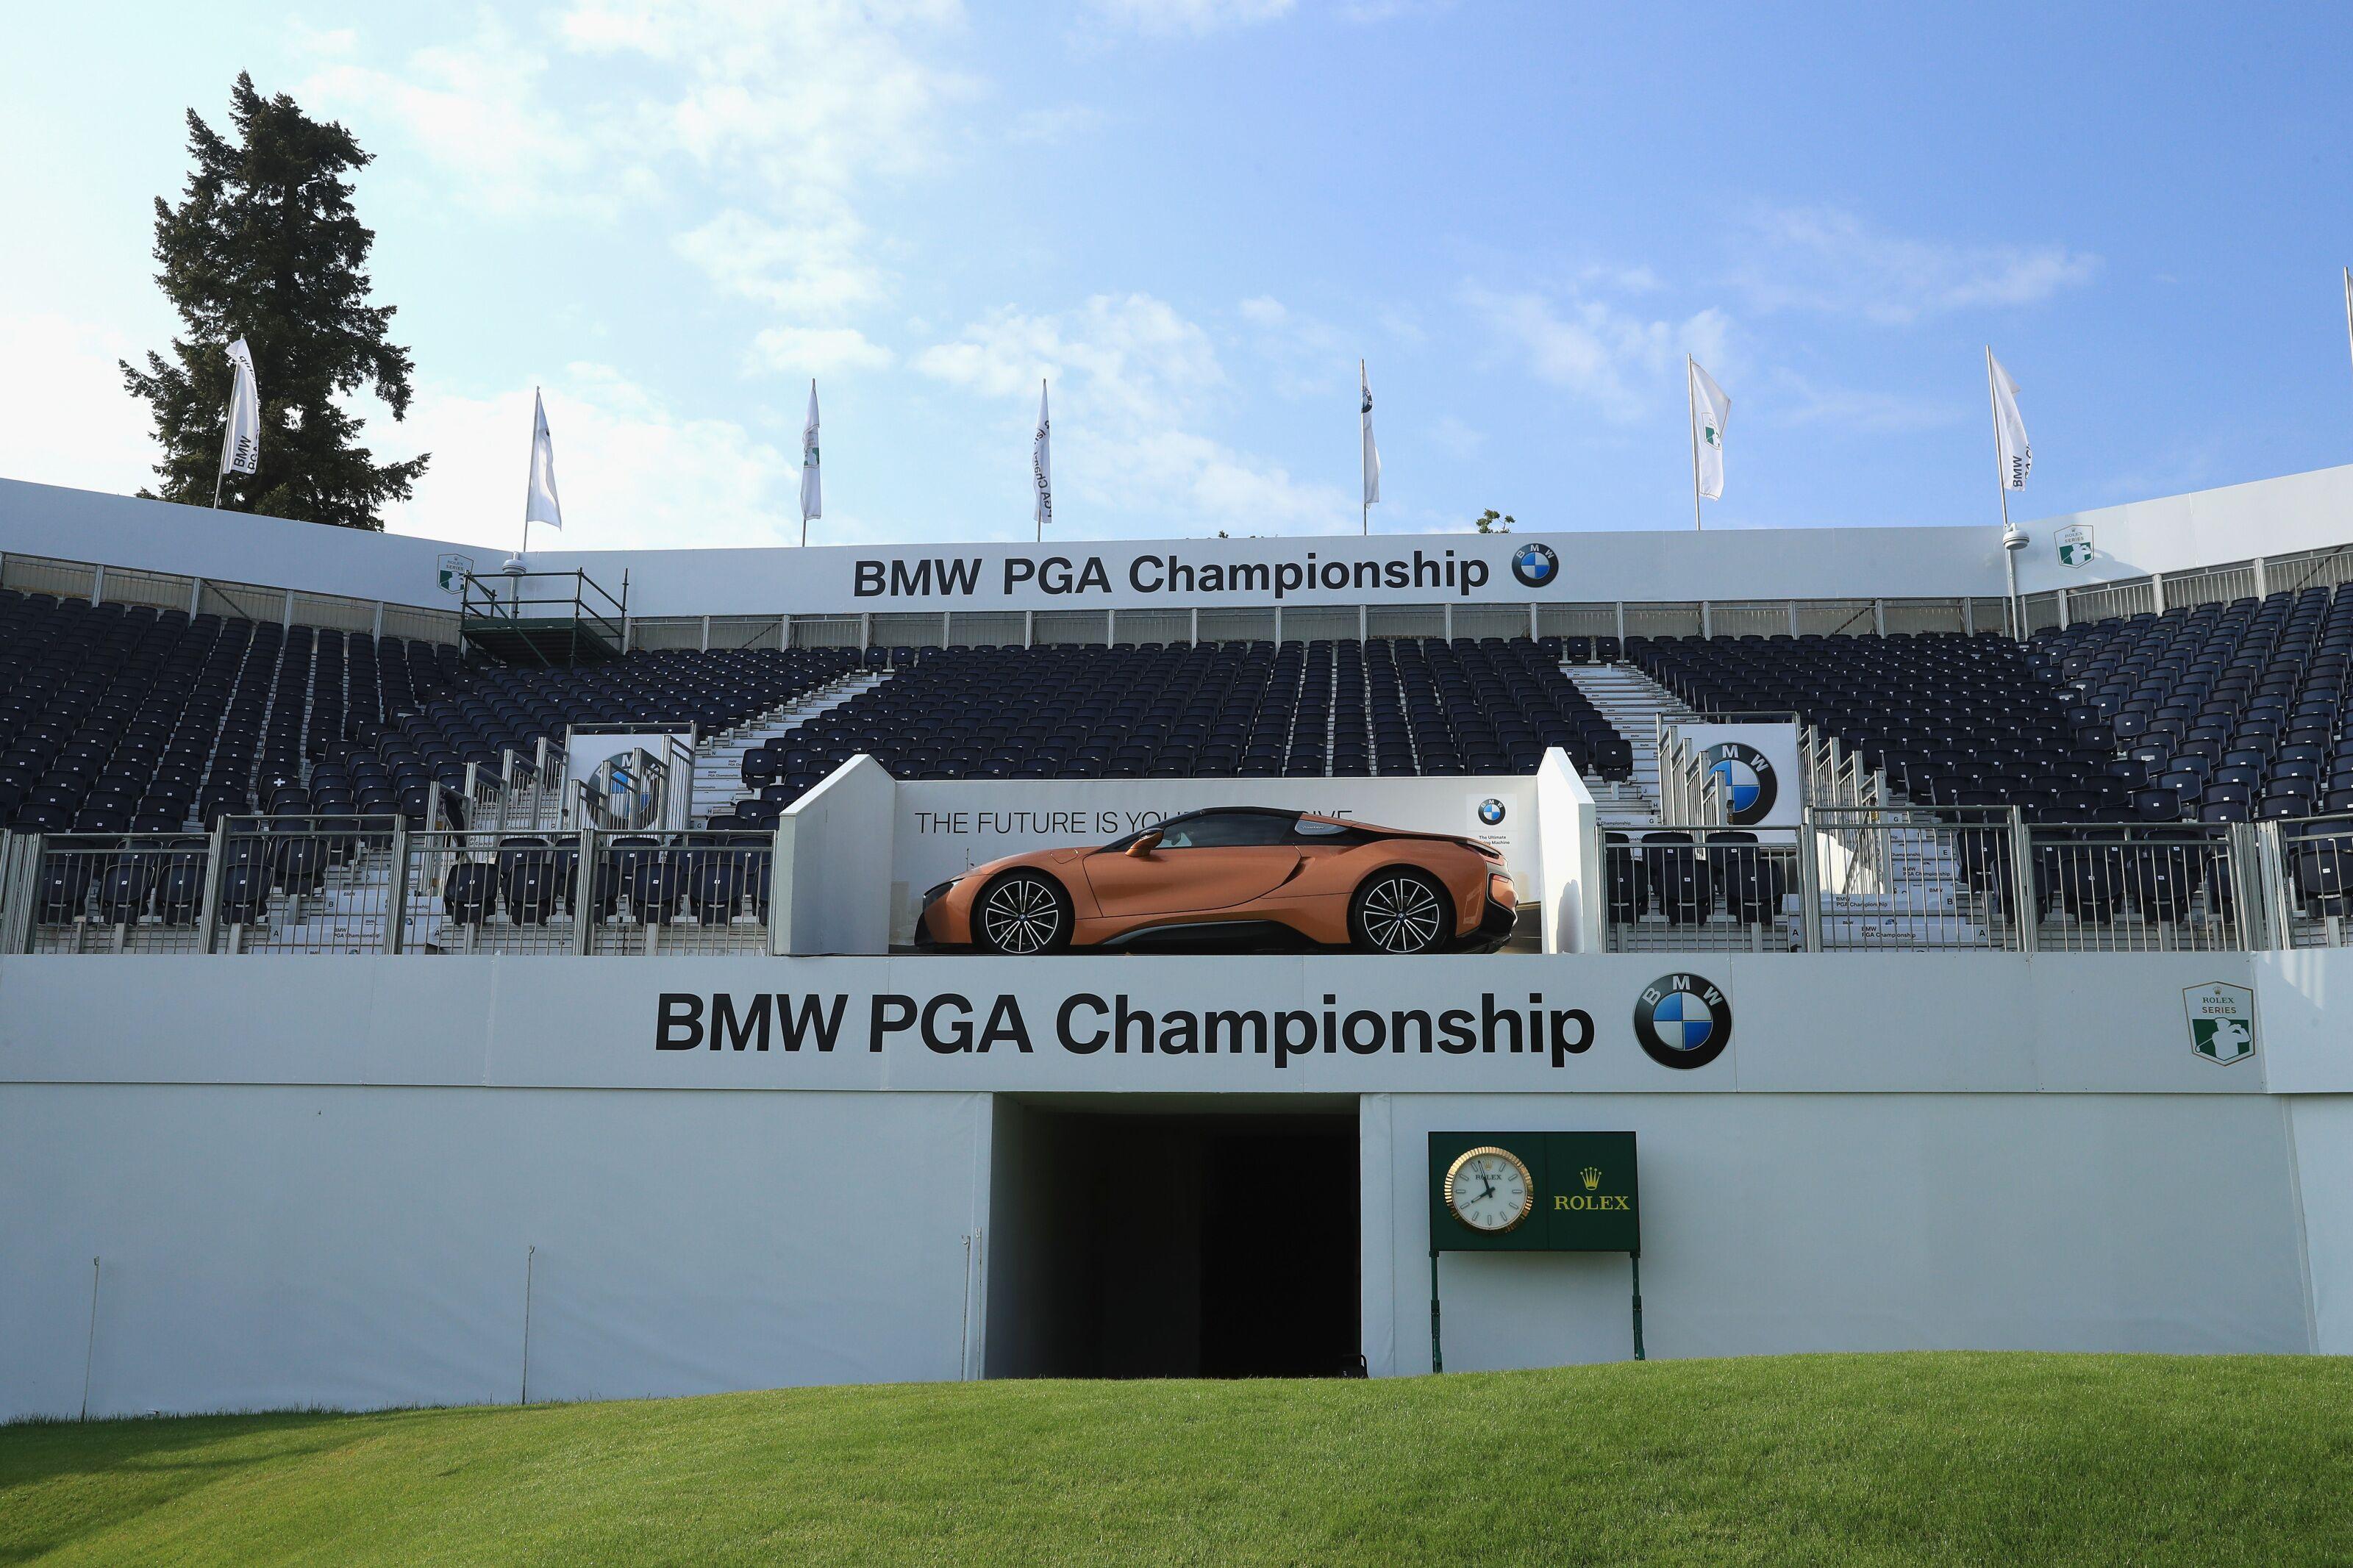 Bmw Pga Championship Power Rankings Top 10 Picks At Wentworth